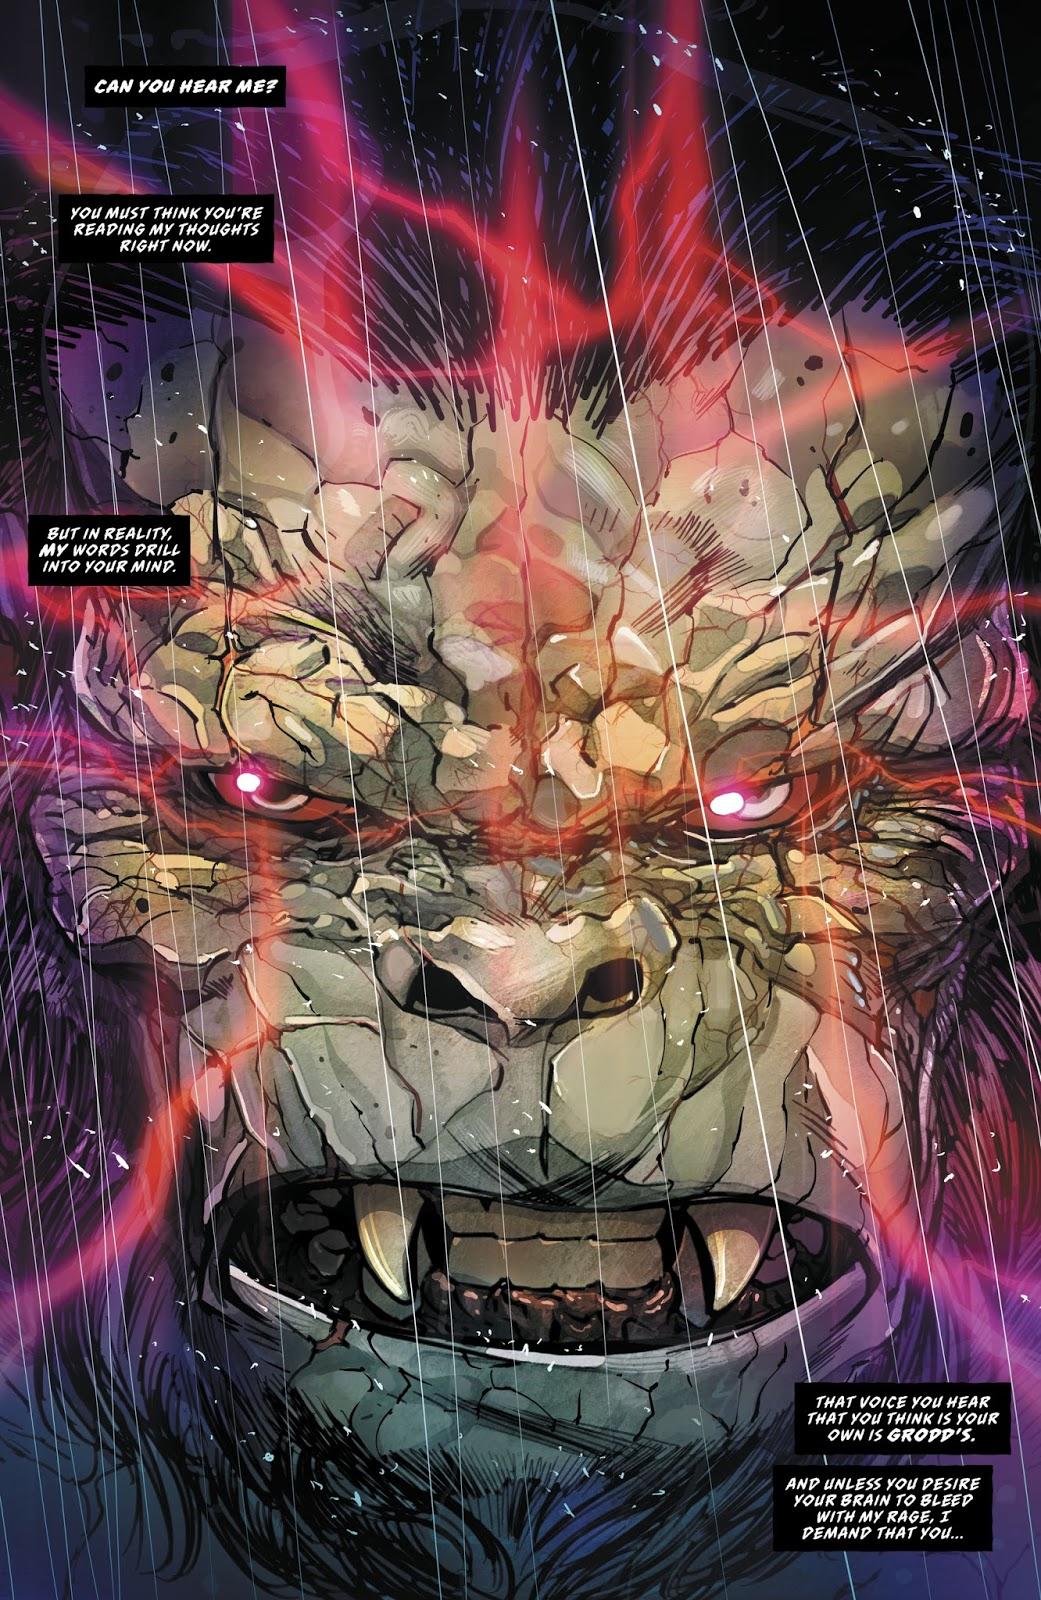 Gorilla Grodd (The Flash Vol. 5 #40)